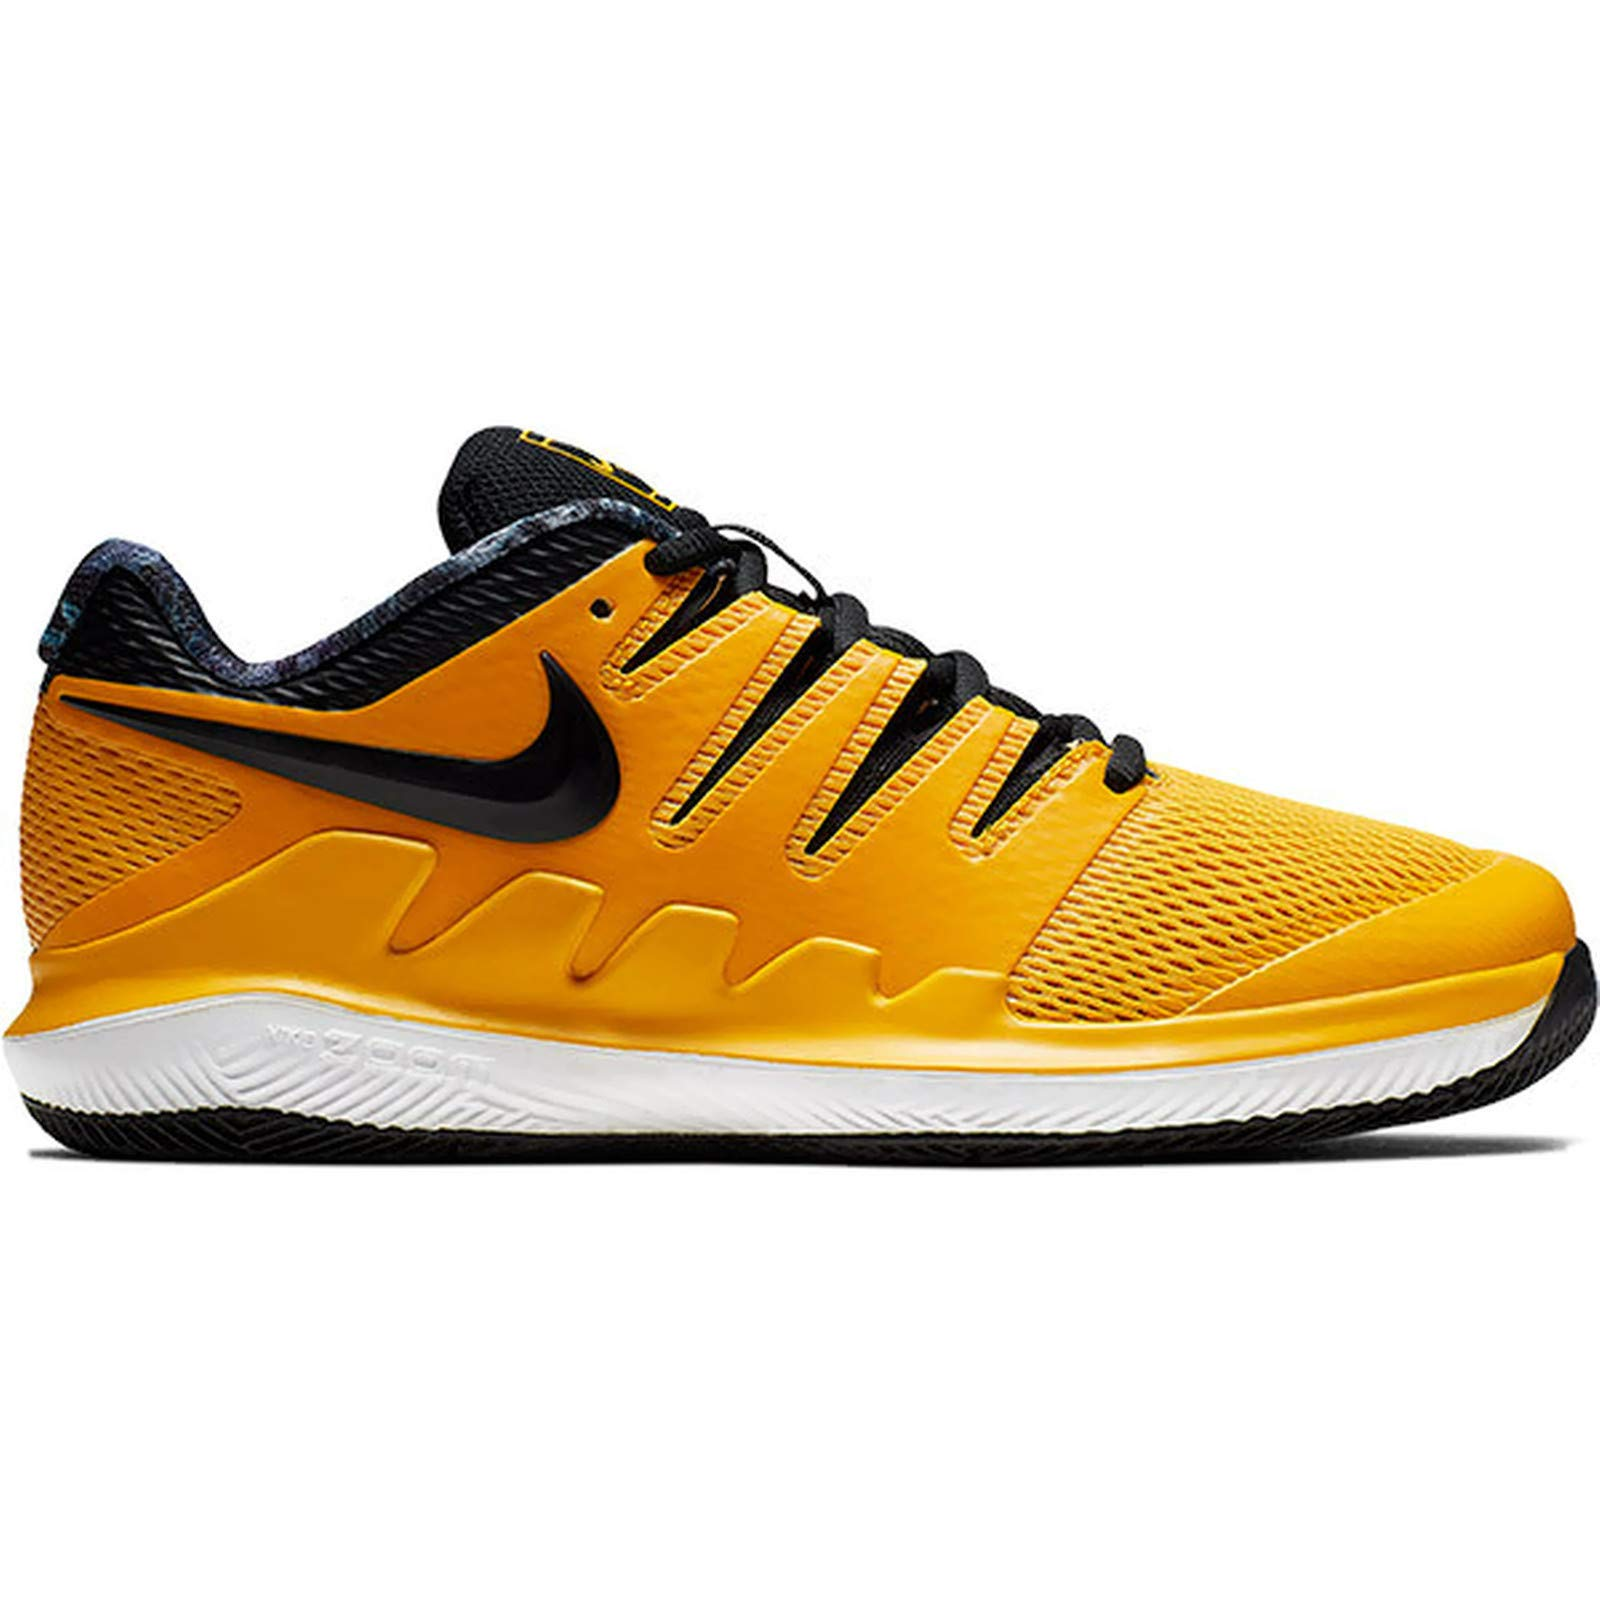 Nike Junior's Vapor X (5 US, University Gold/Black/White/Volt Glow)